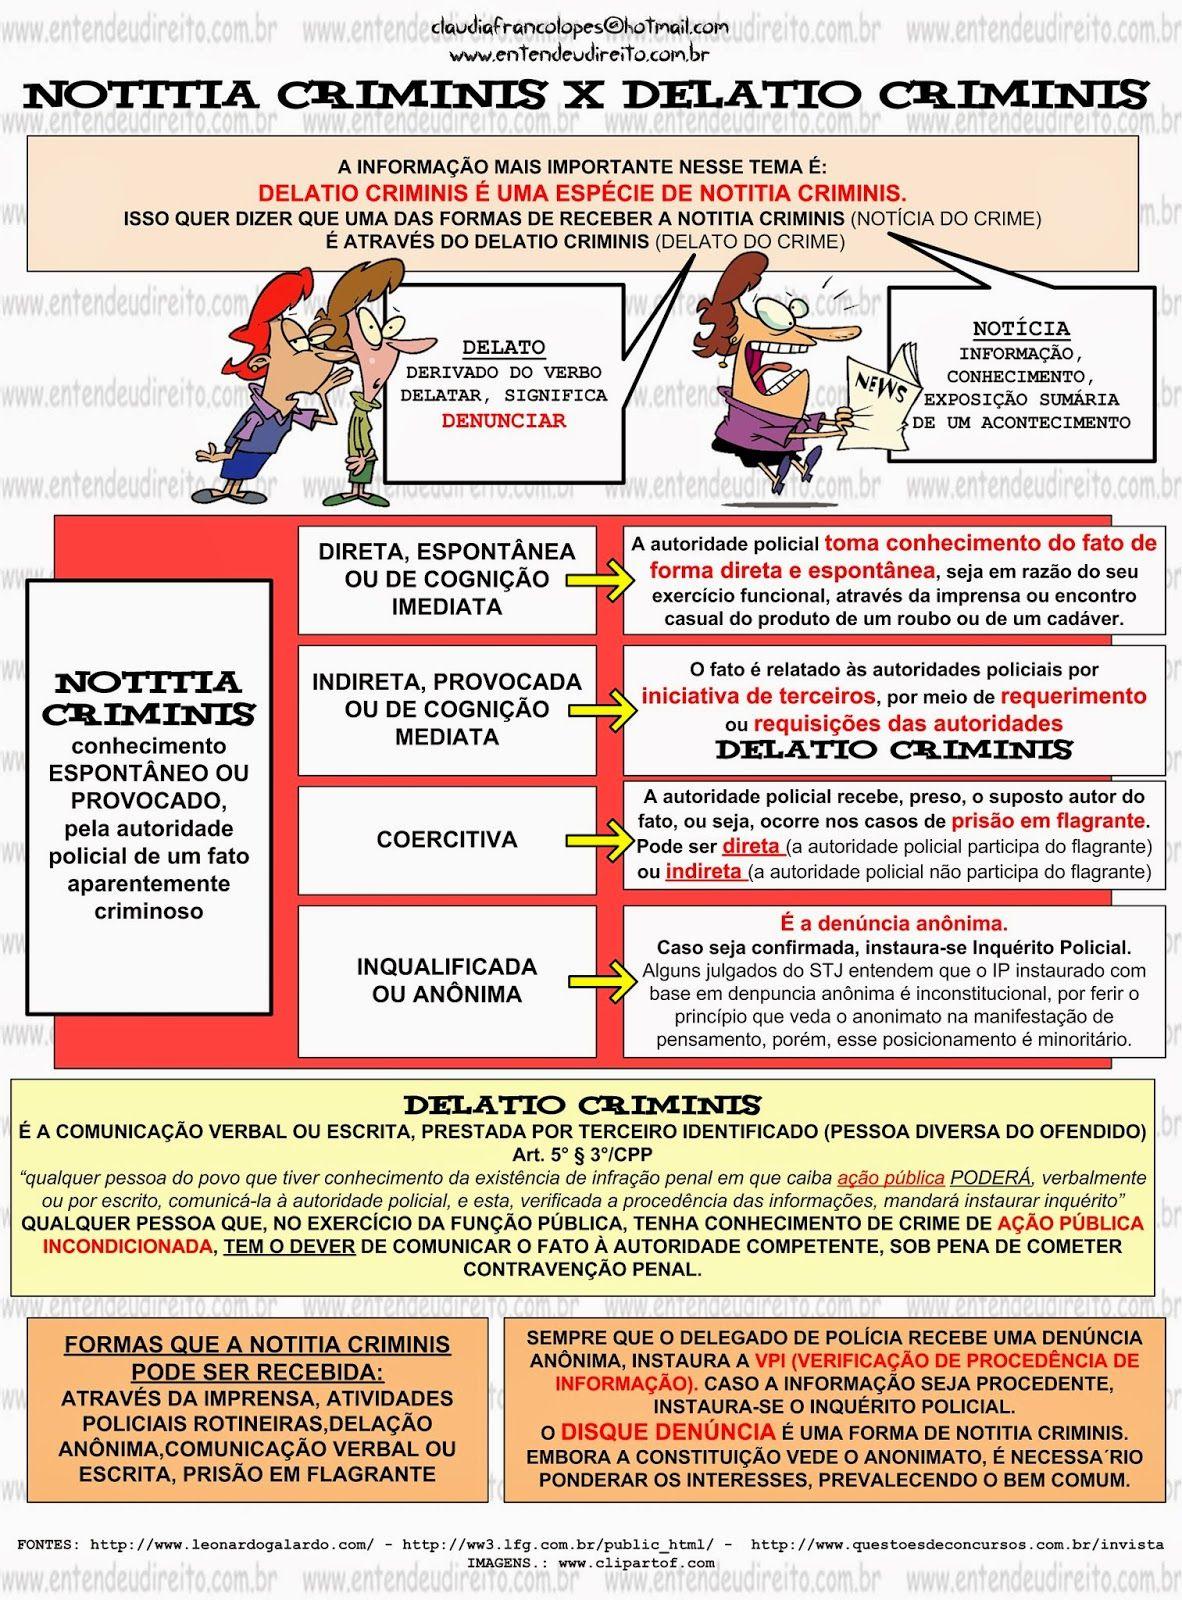 ENTENDEU DIREITO OU QUER QUE DESENHE ???: NOTITIA CRIMINIS X DELATIO CRIMINIS